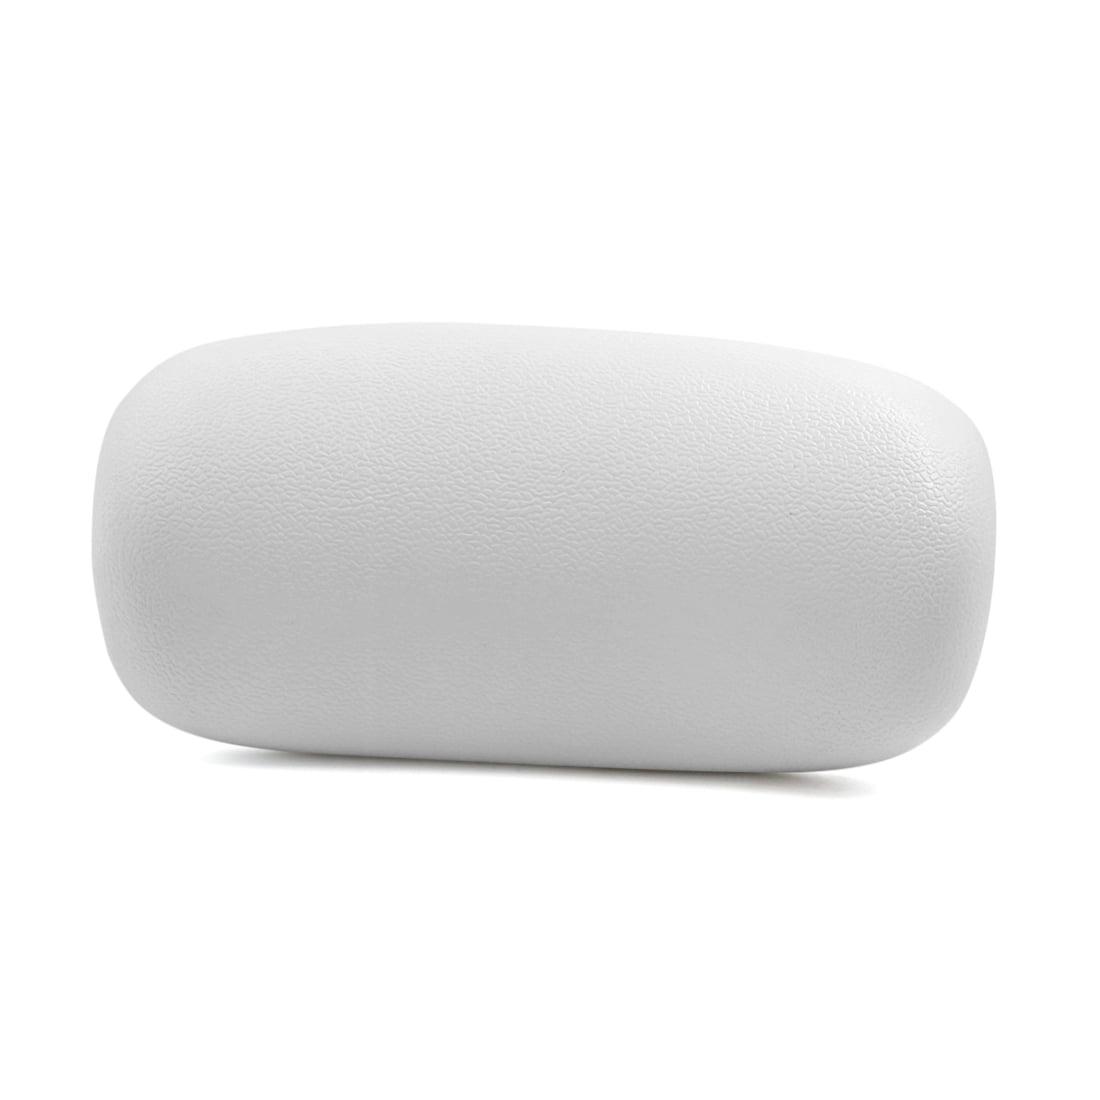 Soft Foam Padded Spa Bath Pillow Hot Tub Head Back Cushion 9\